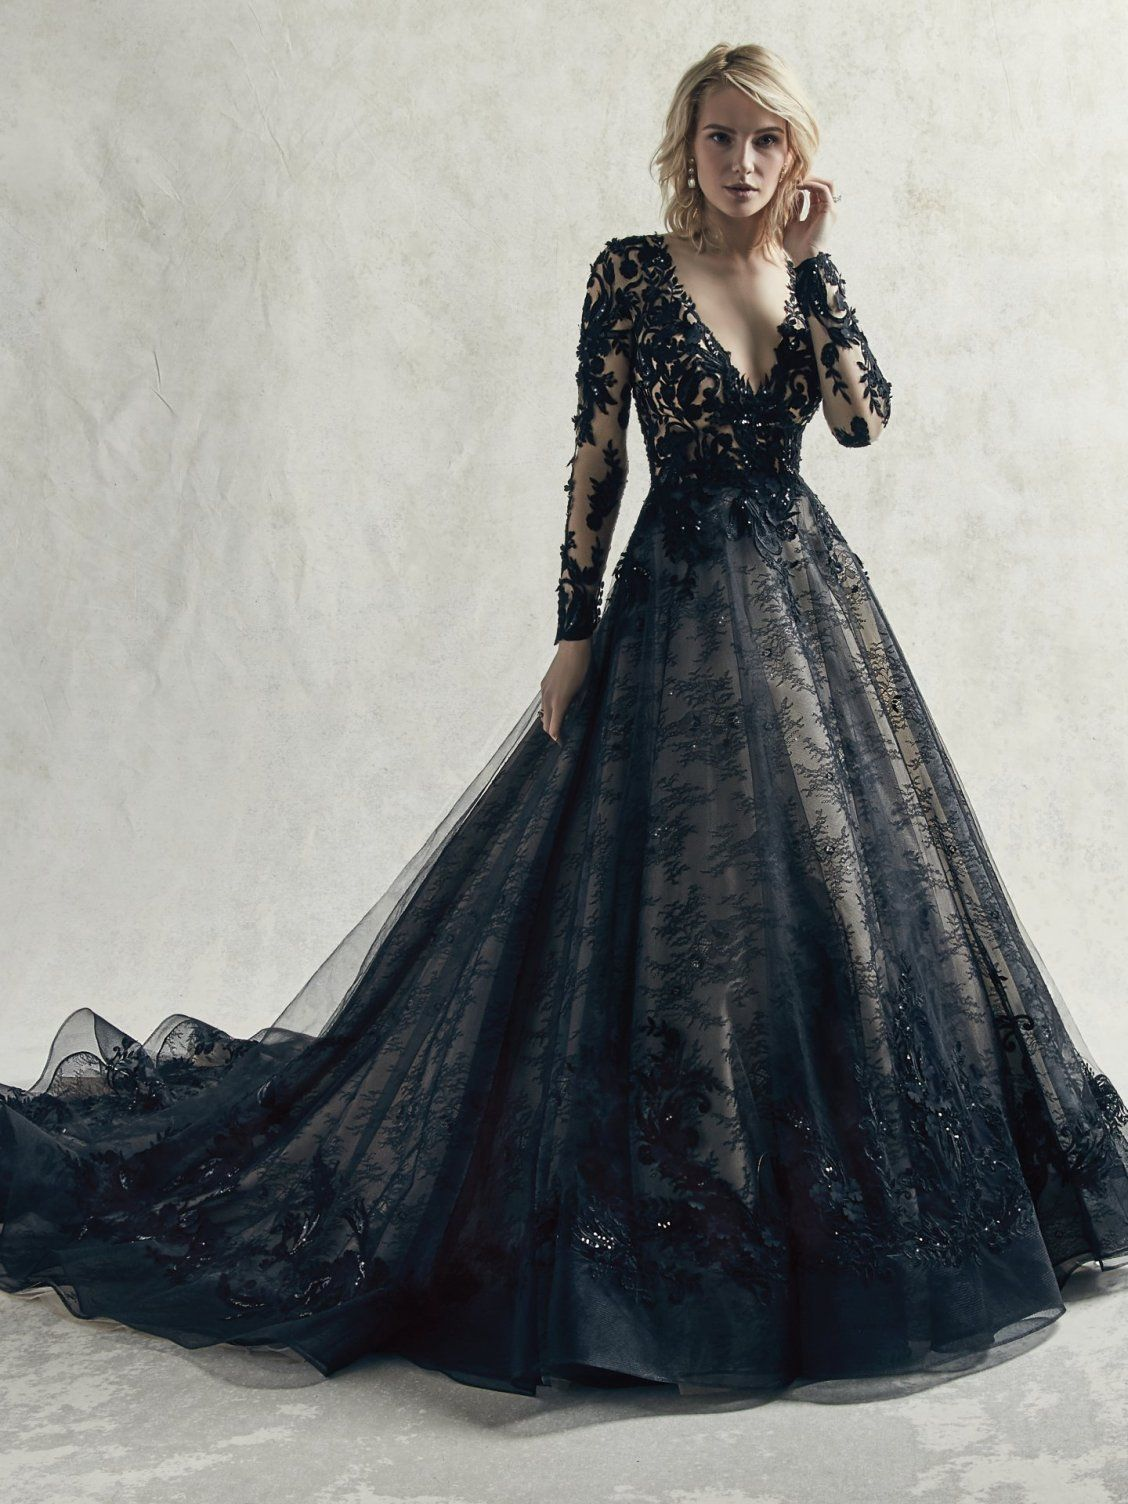 Zander By Sottero And Midgley Wedding Dresses Black Lace Wedding Dress Black Lace Wedding Ball Gowns Wedding